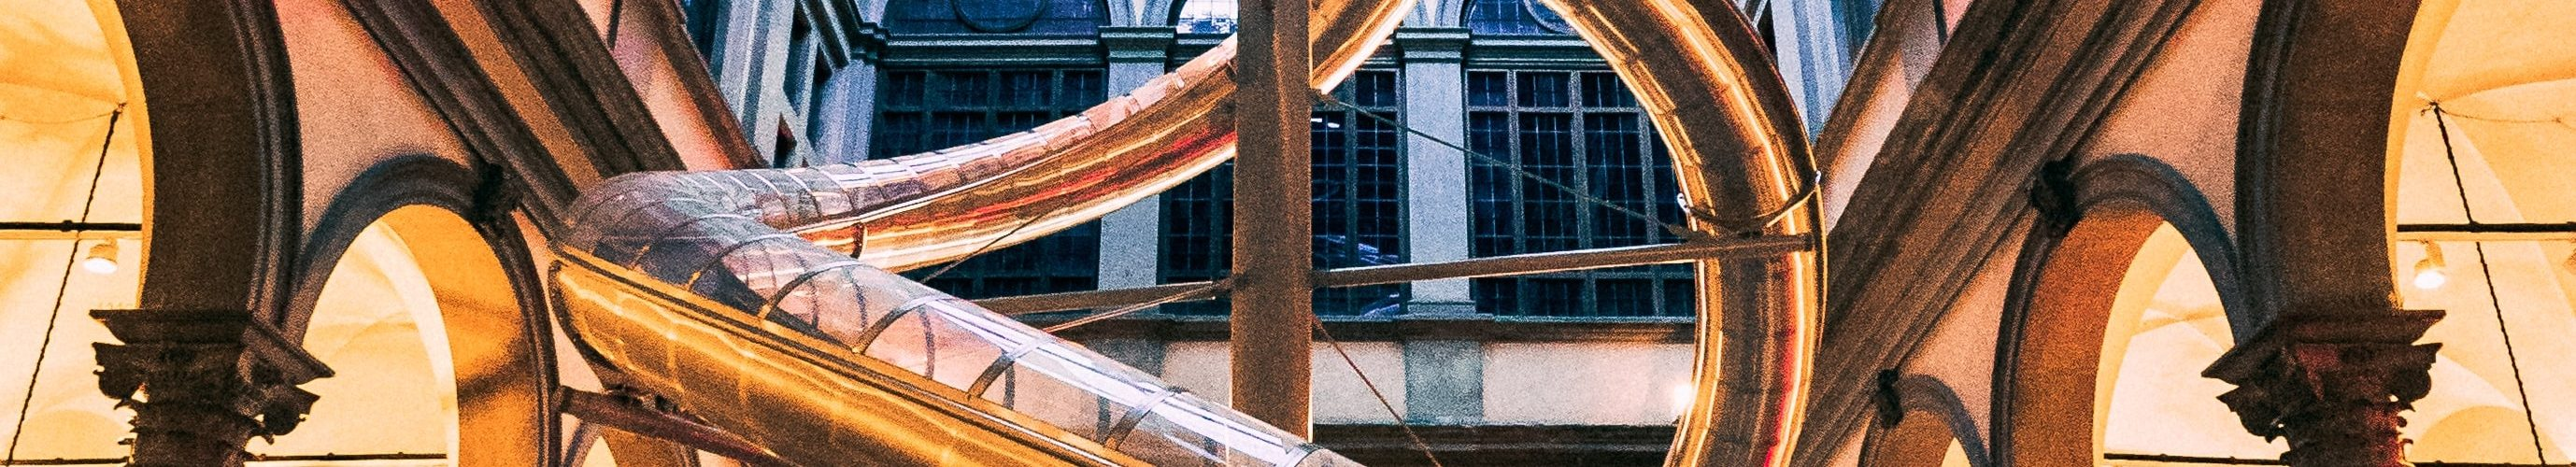 metalen-tunnel-glijbaan